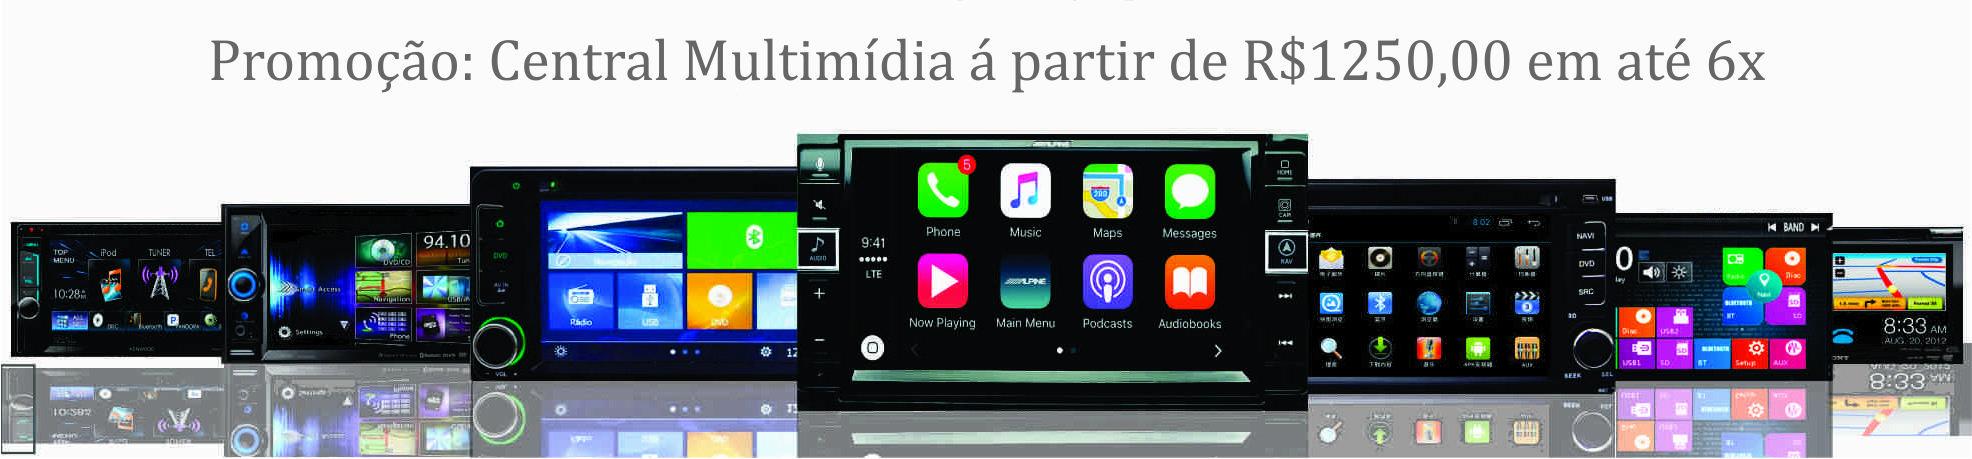 Central Multimdia Android Original, Todos os Modelos